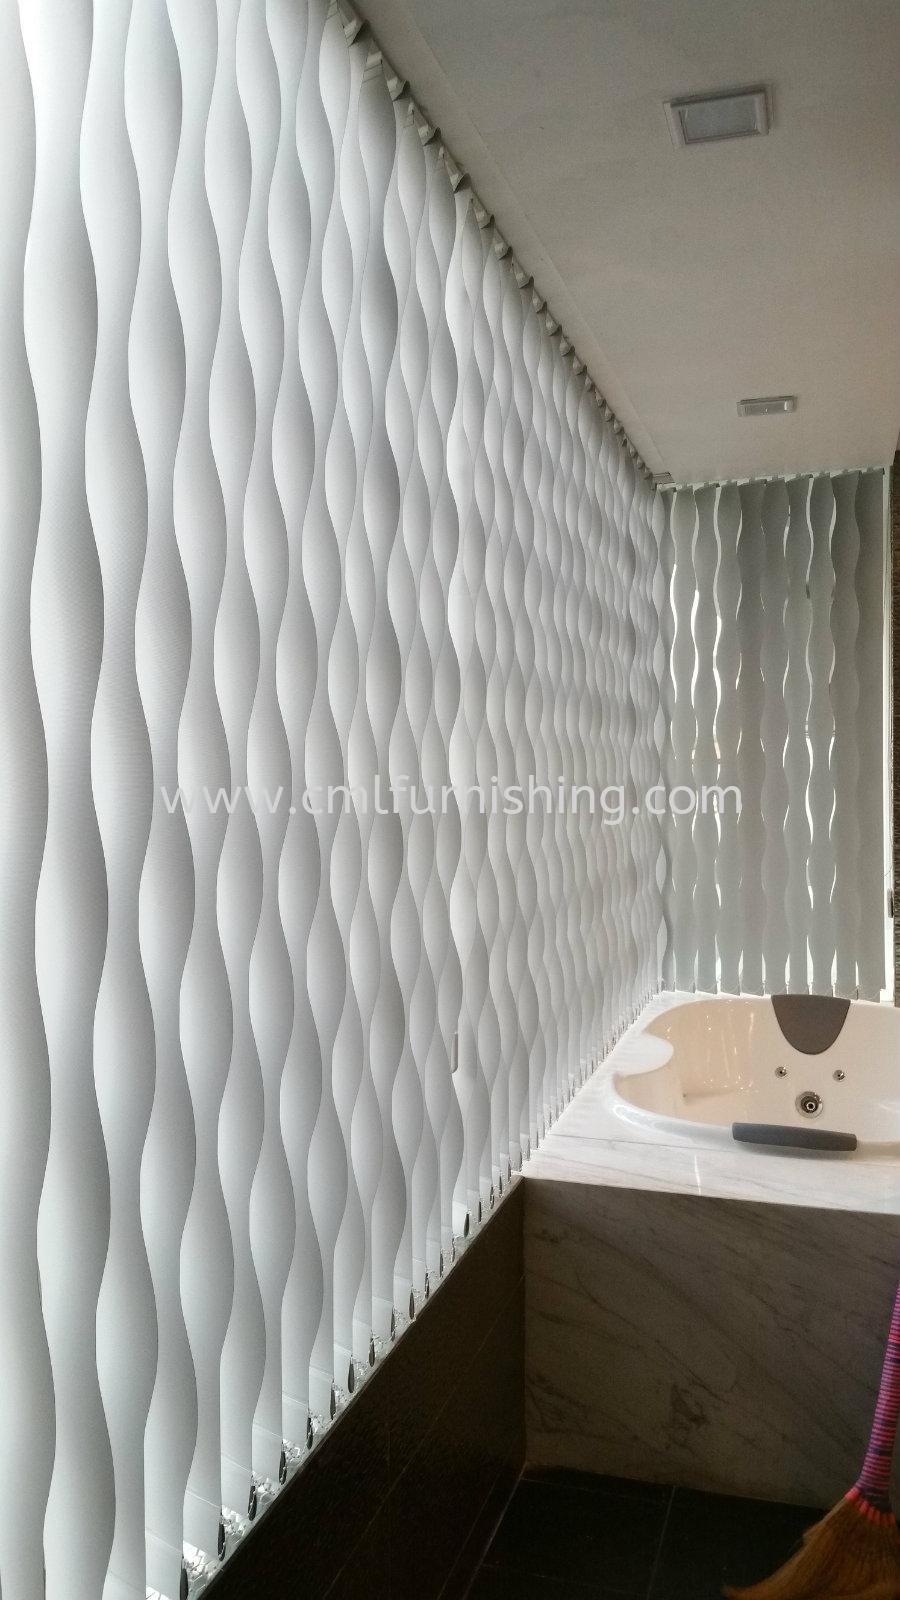 Wallpaper , Motorized Curtain , Wall Panel , S-Wave Vertical , Zibra , Motorized Roller